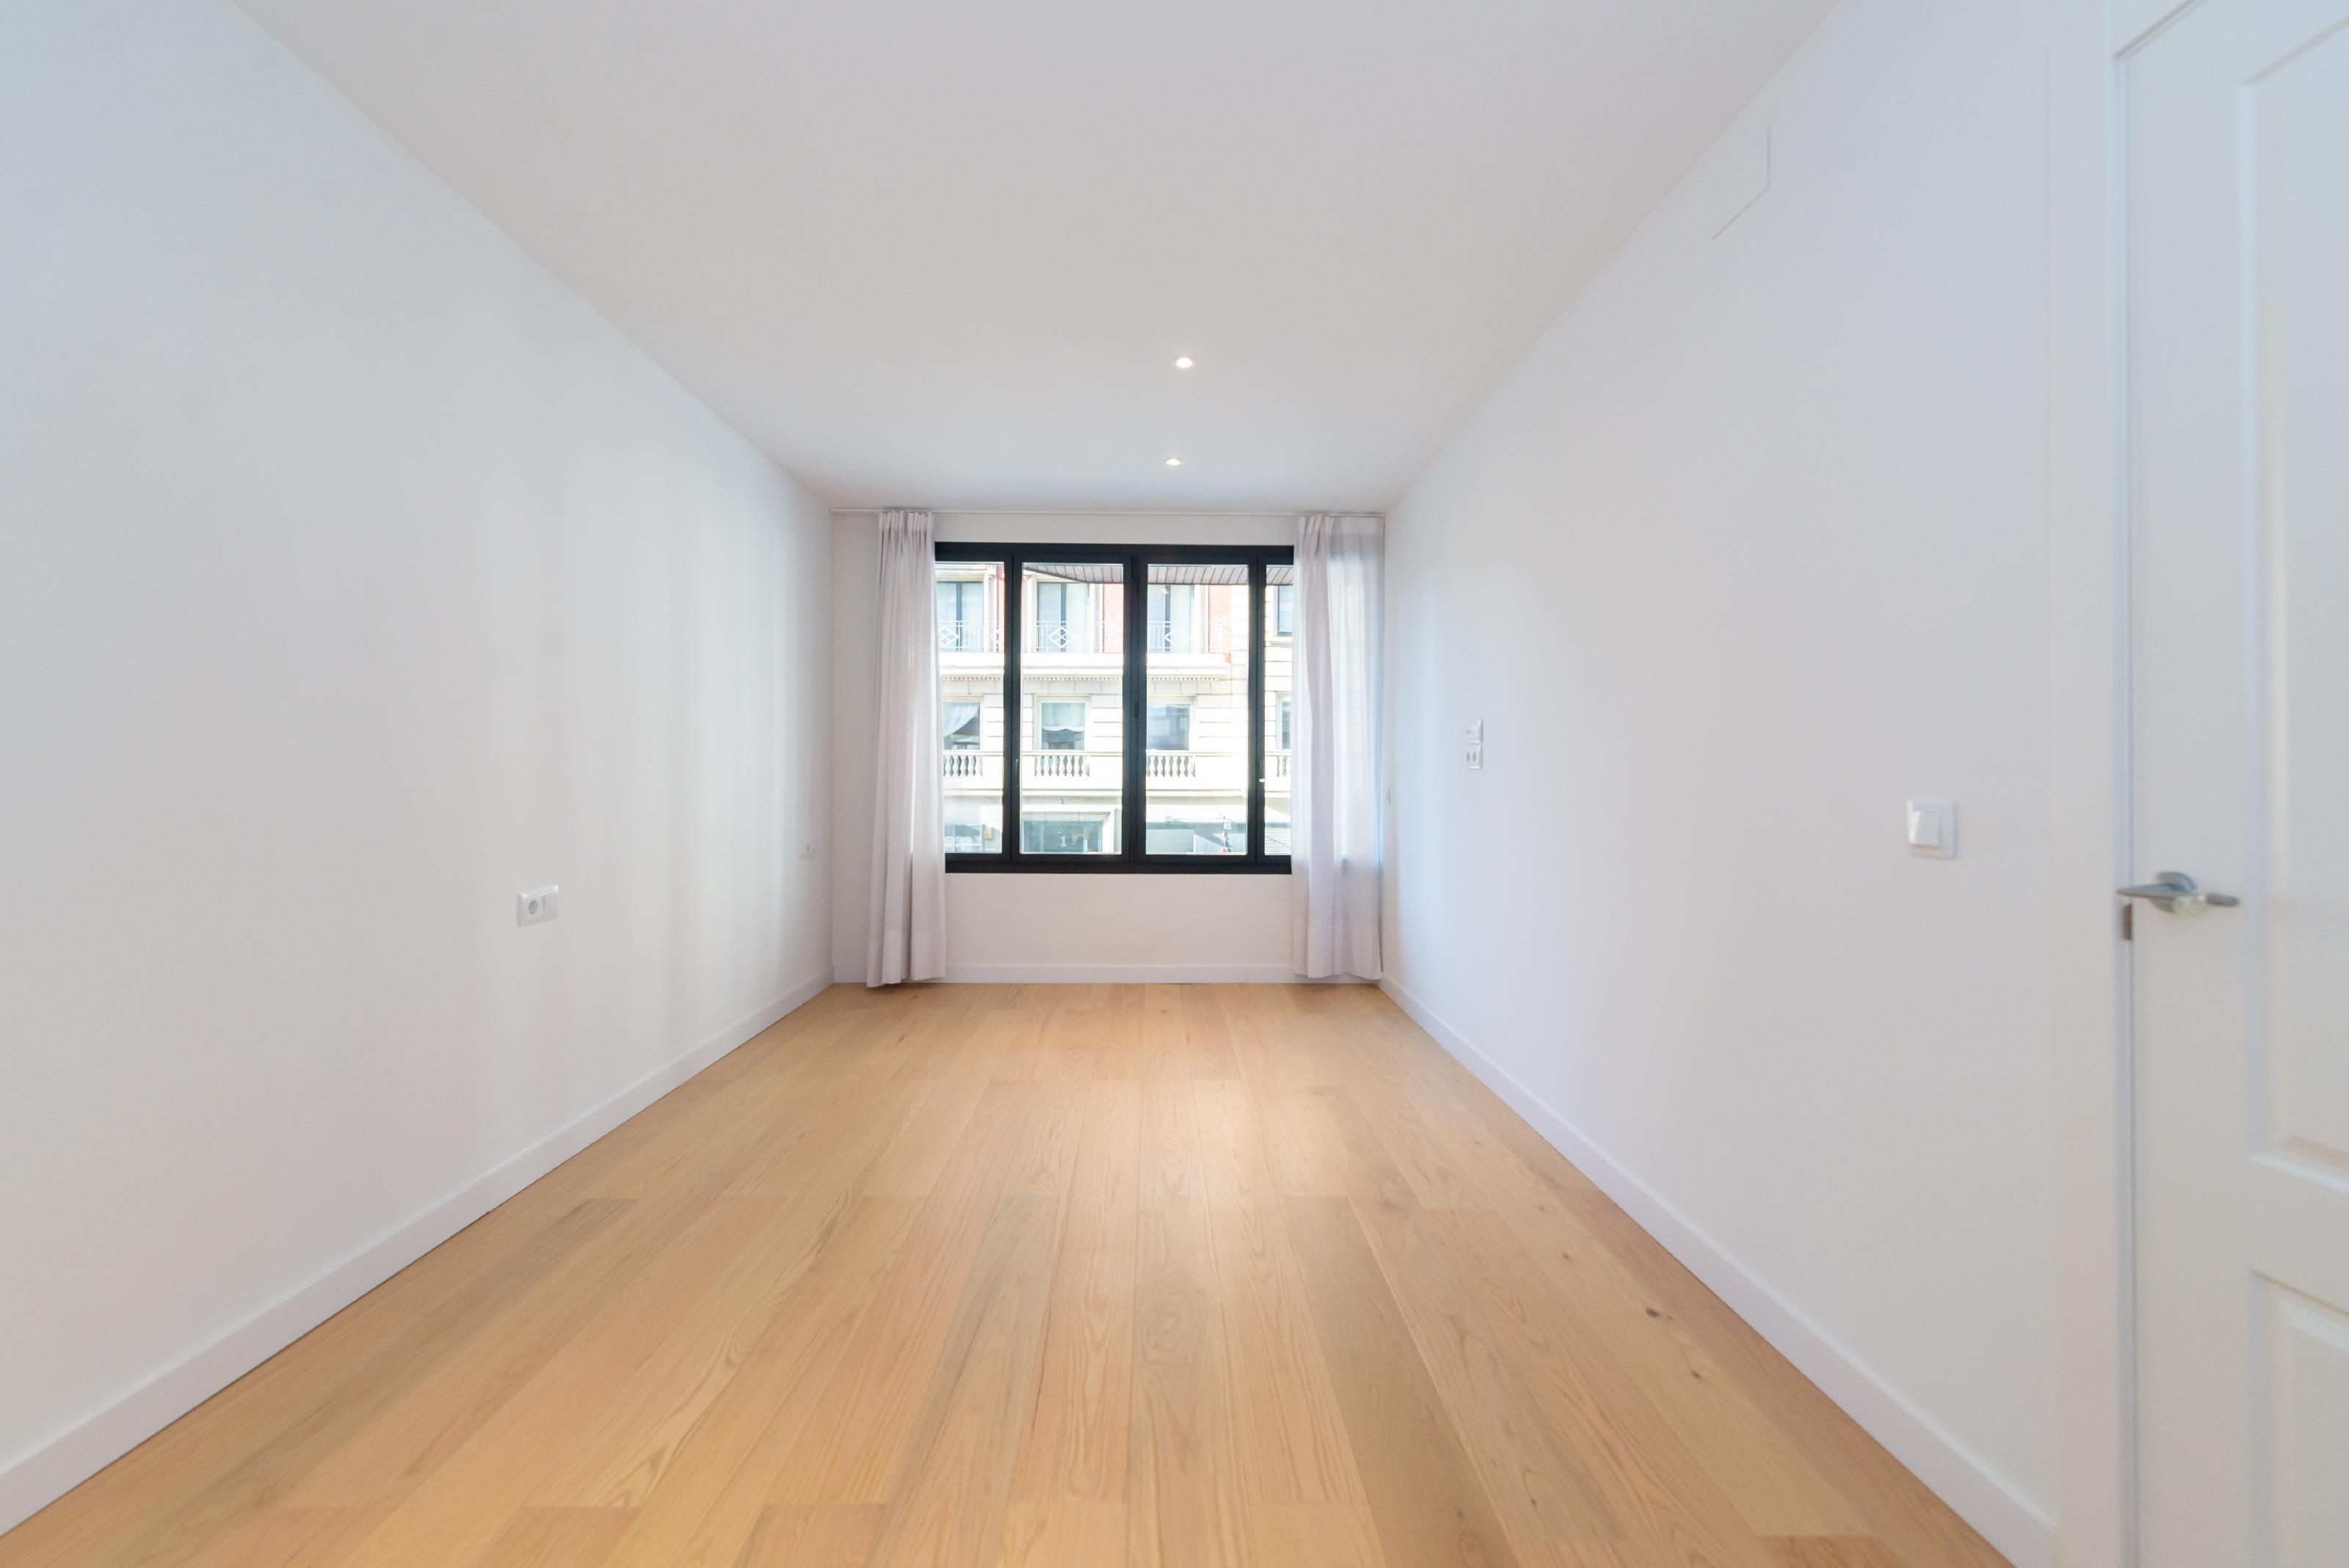 245231 Flat for sale in Sarrià-Sant Gervasi, Sant Gervasi-Galvany 28